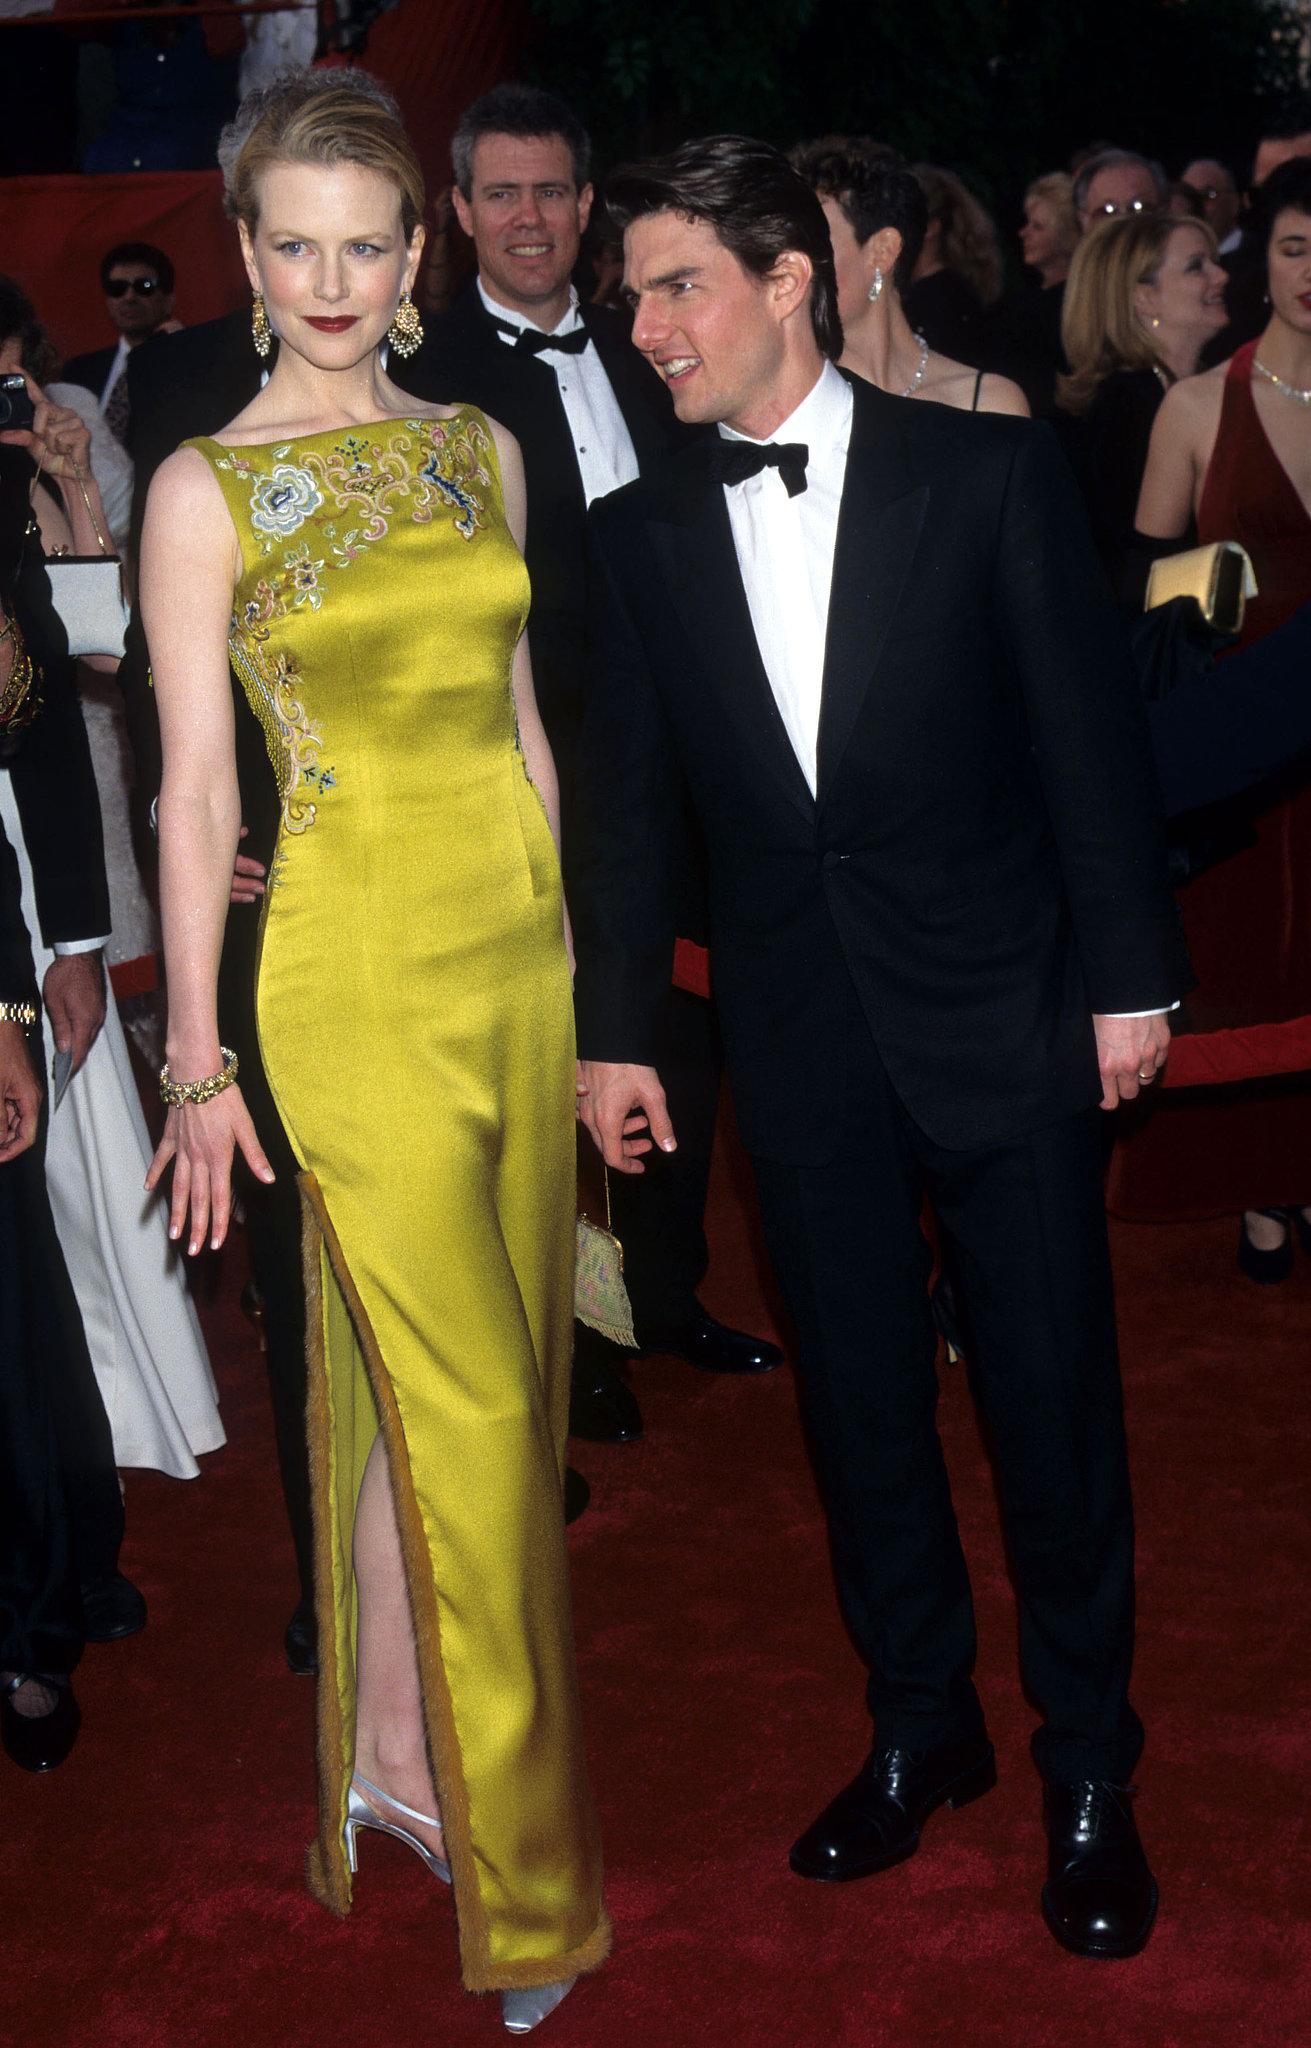 Nicole Kidman at the 1997 Academy Awards